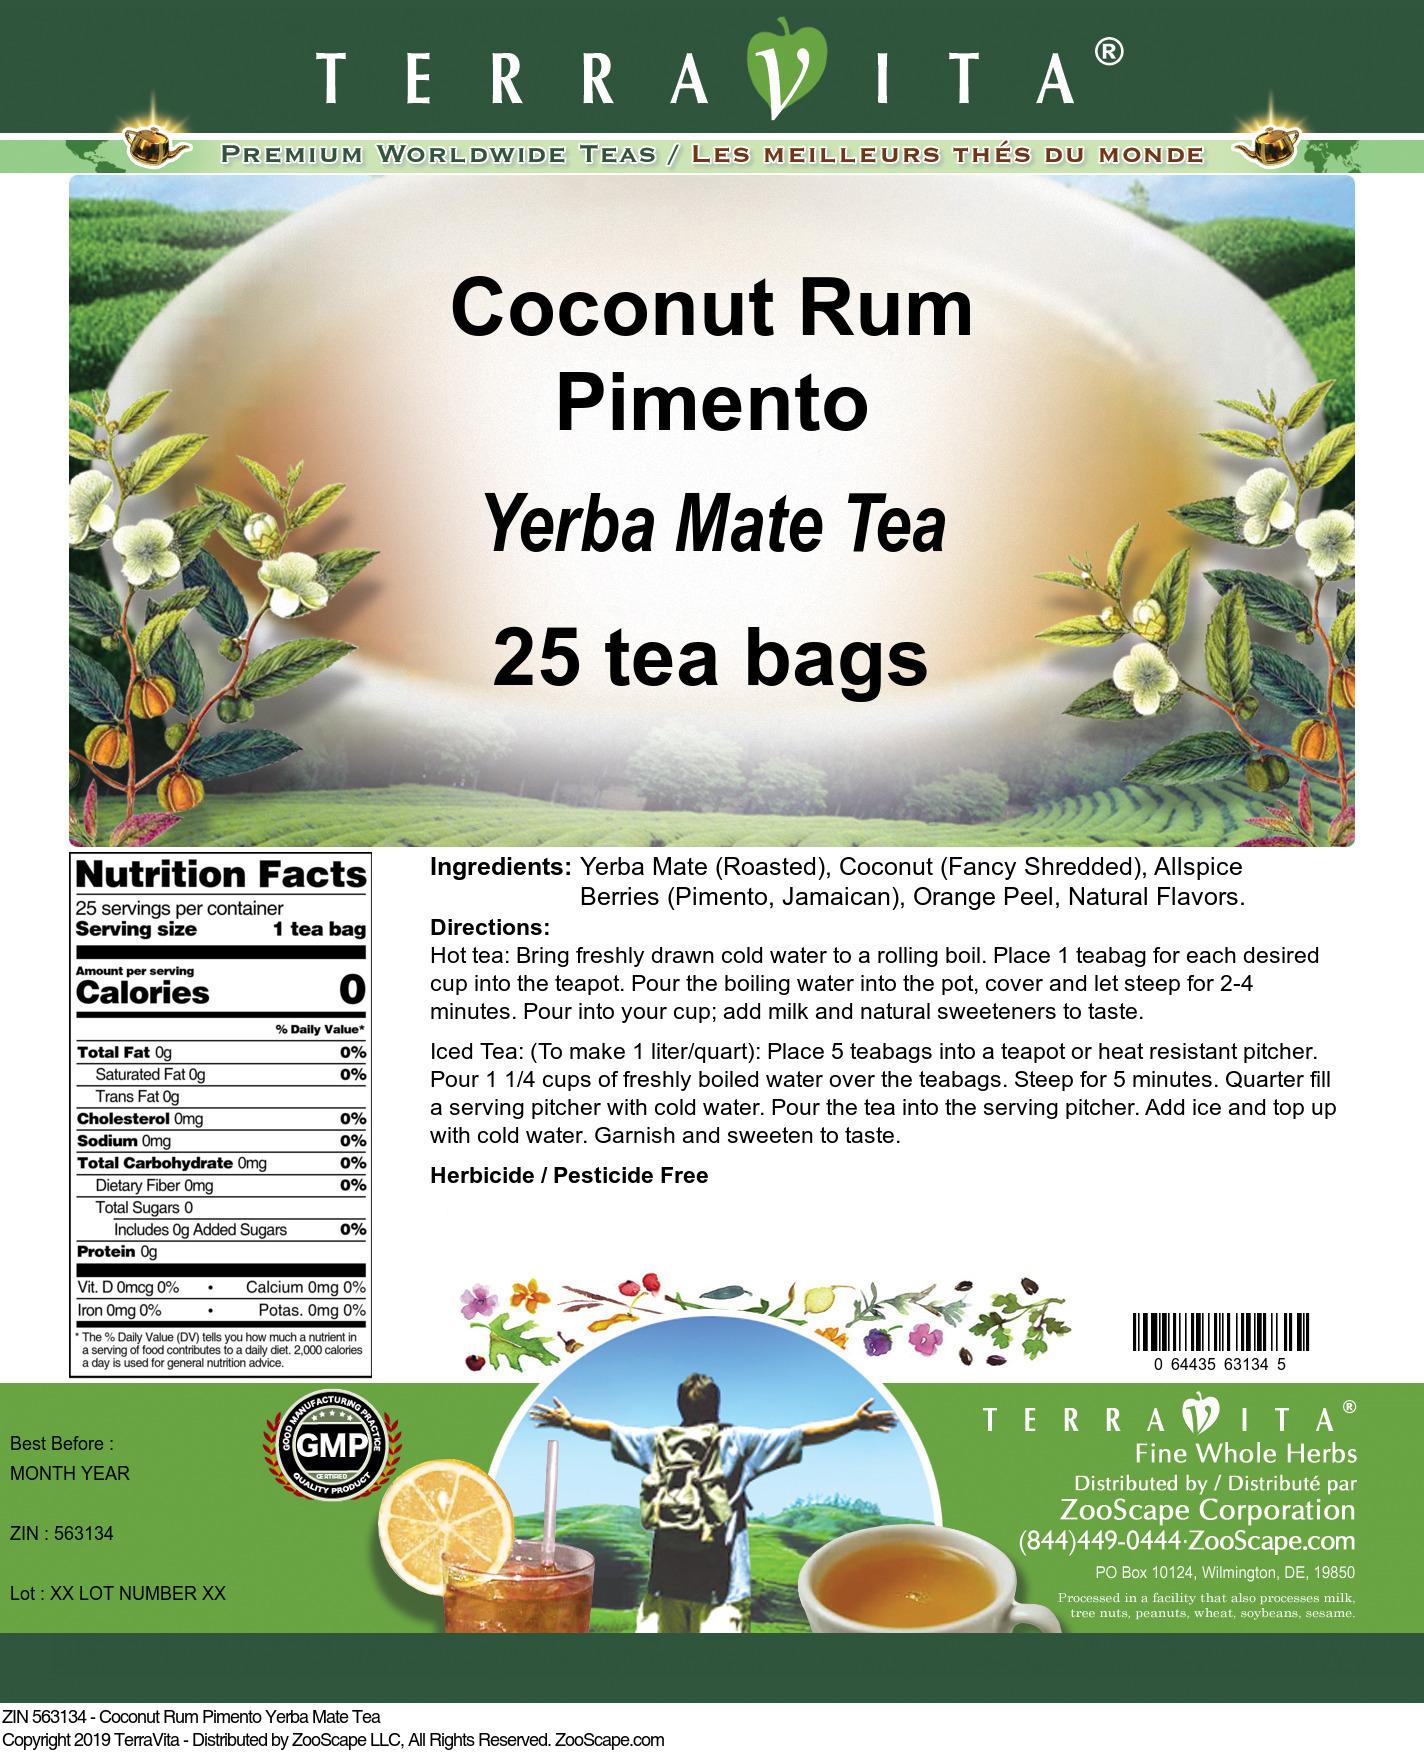 Coconut Rum Pimento Yerba Mate Tea